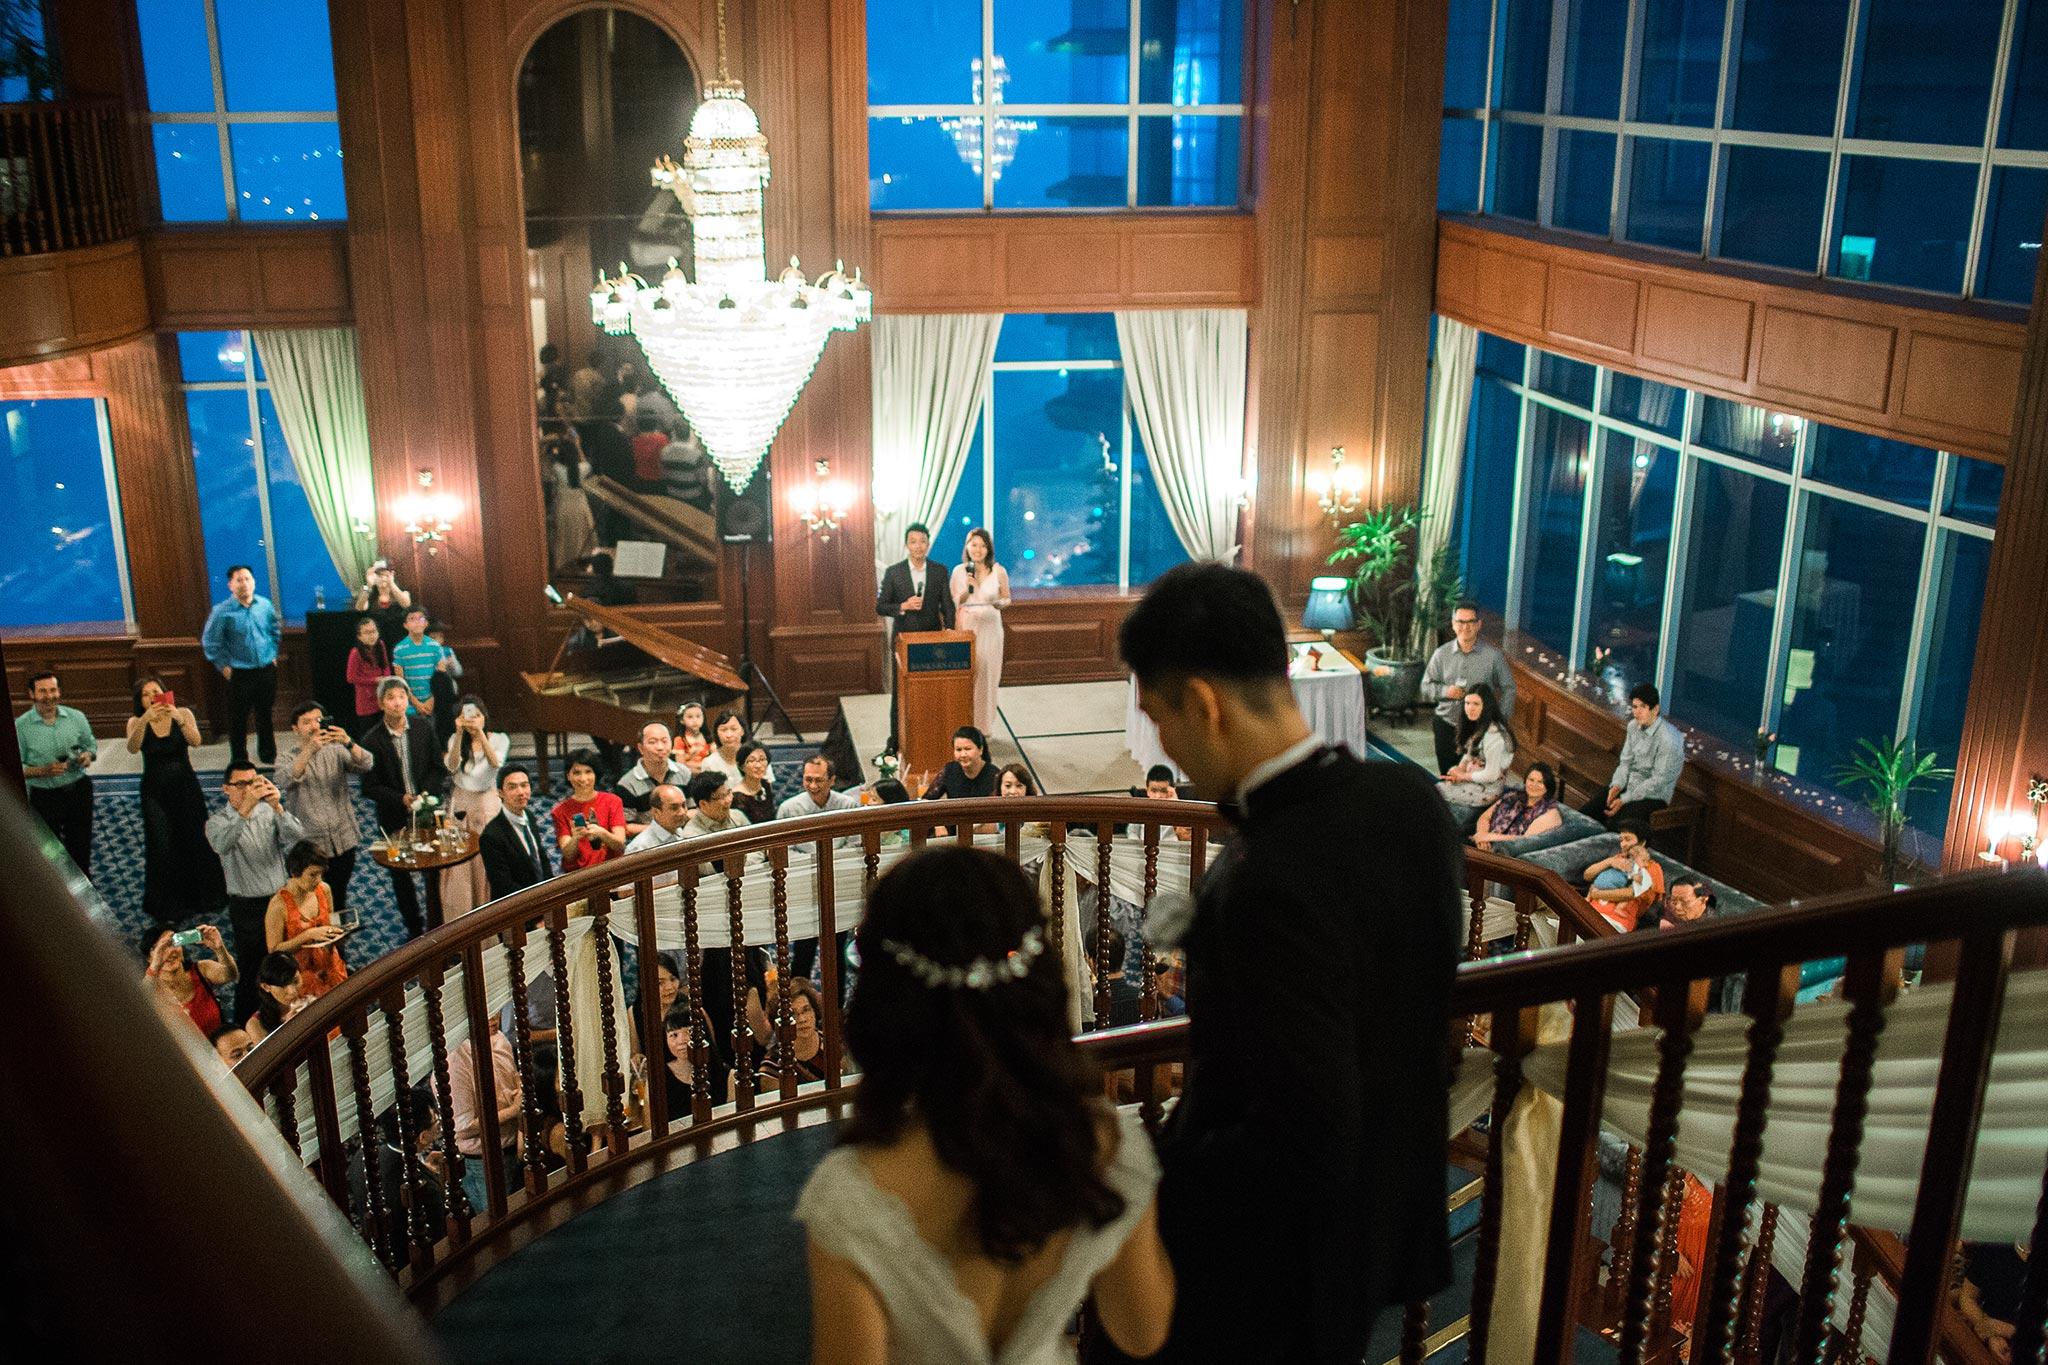 Bankers-Club-Kuala-Lumpur-Wedding-dinner